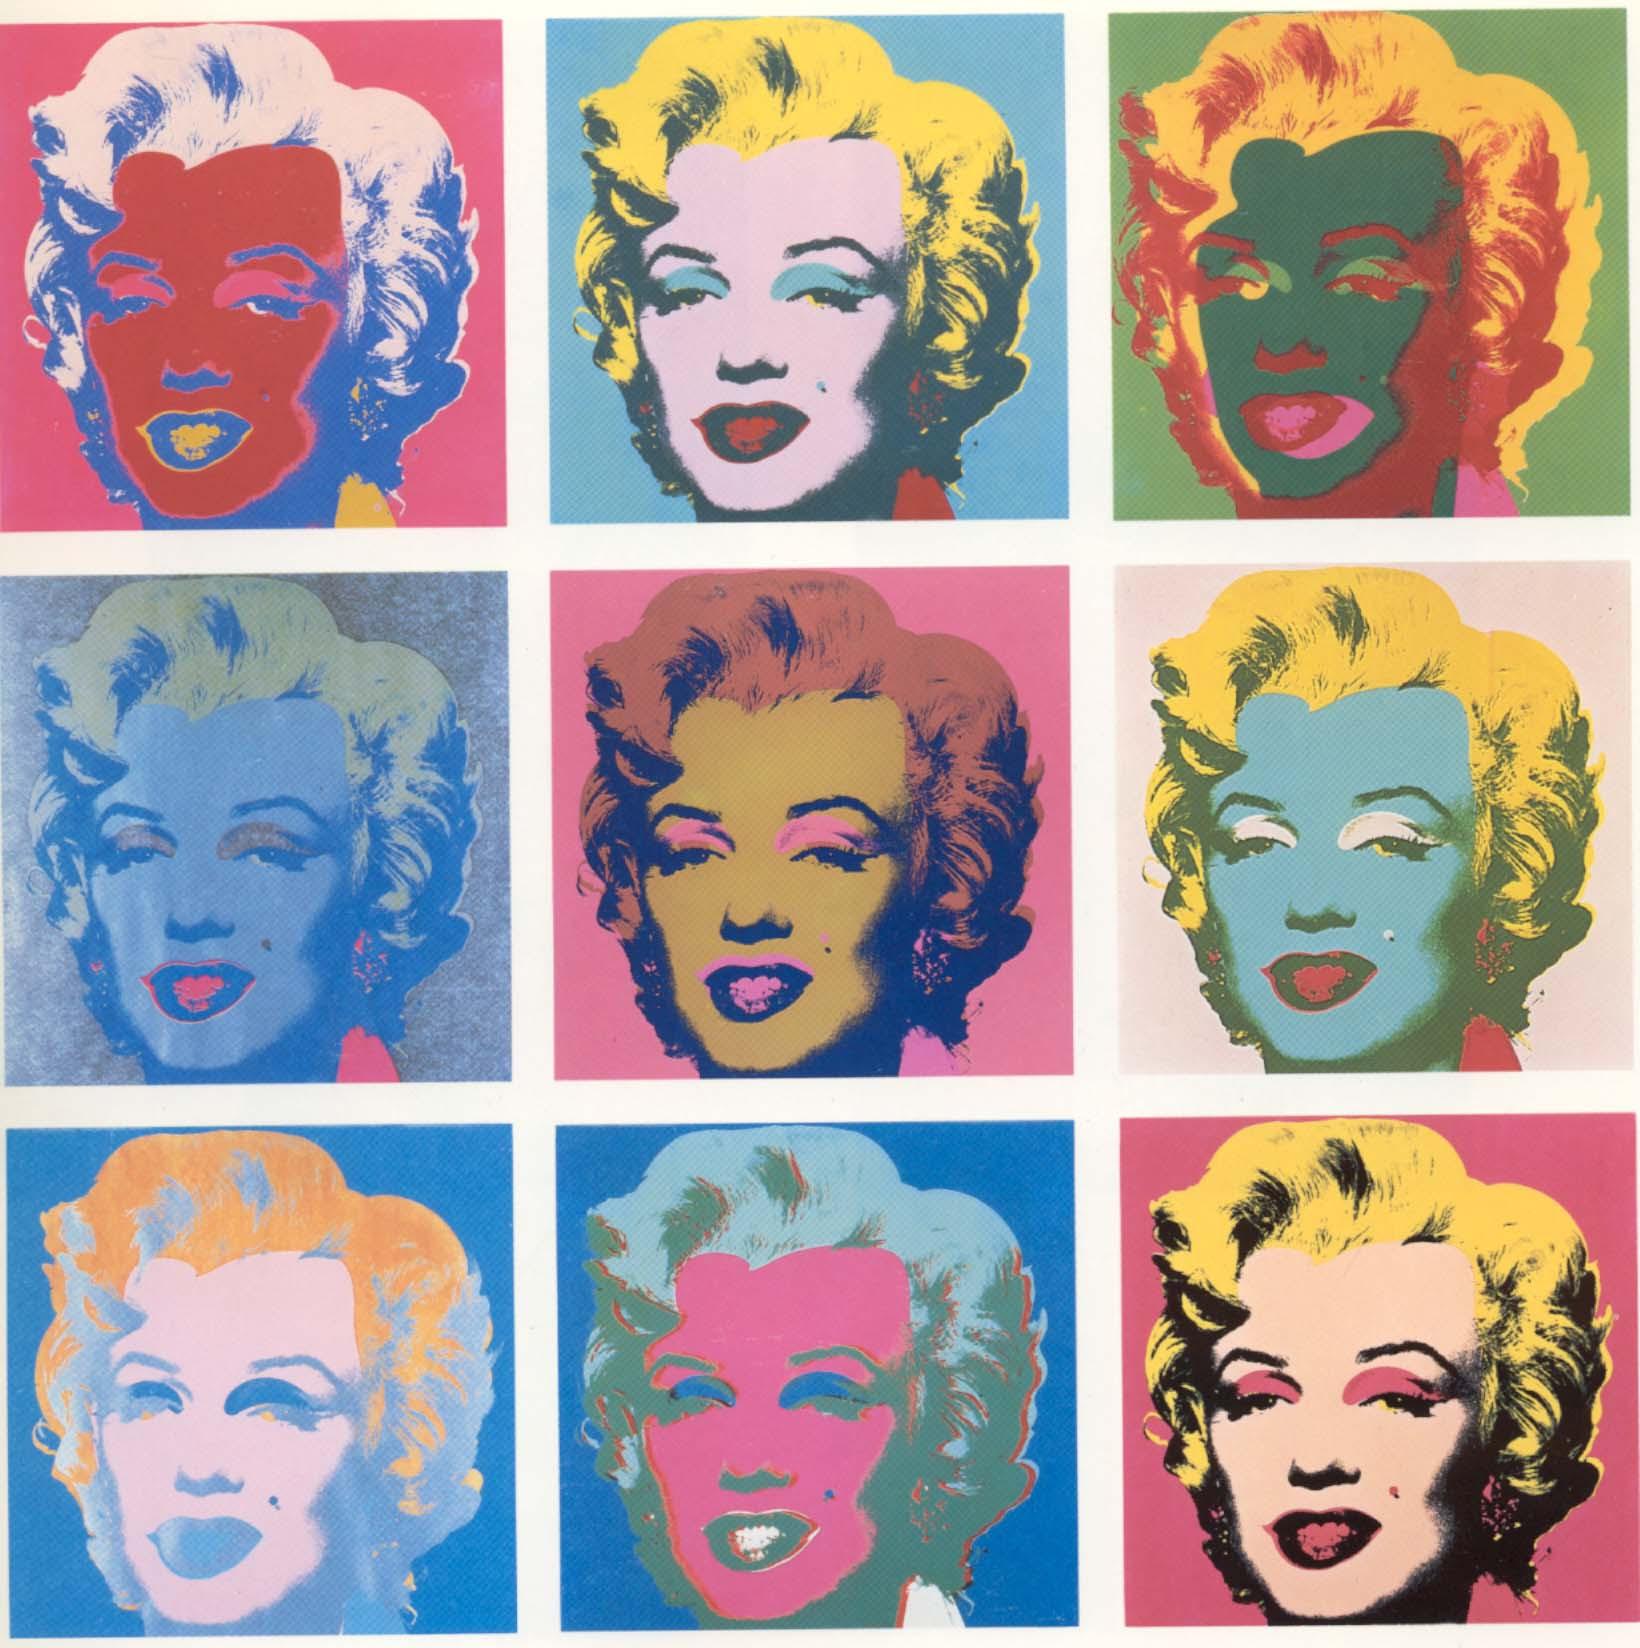 http://www.vistelacalle.com/wp-content/uploads/2011/03/andy-warhol-marilyn.jpg